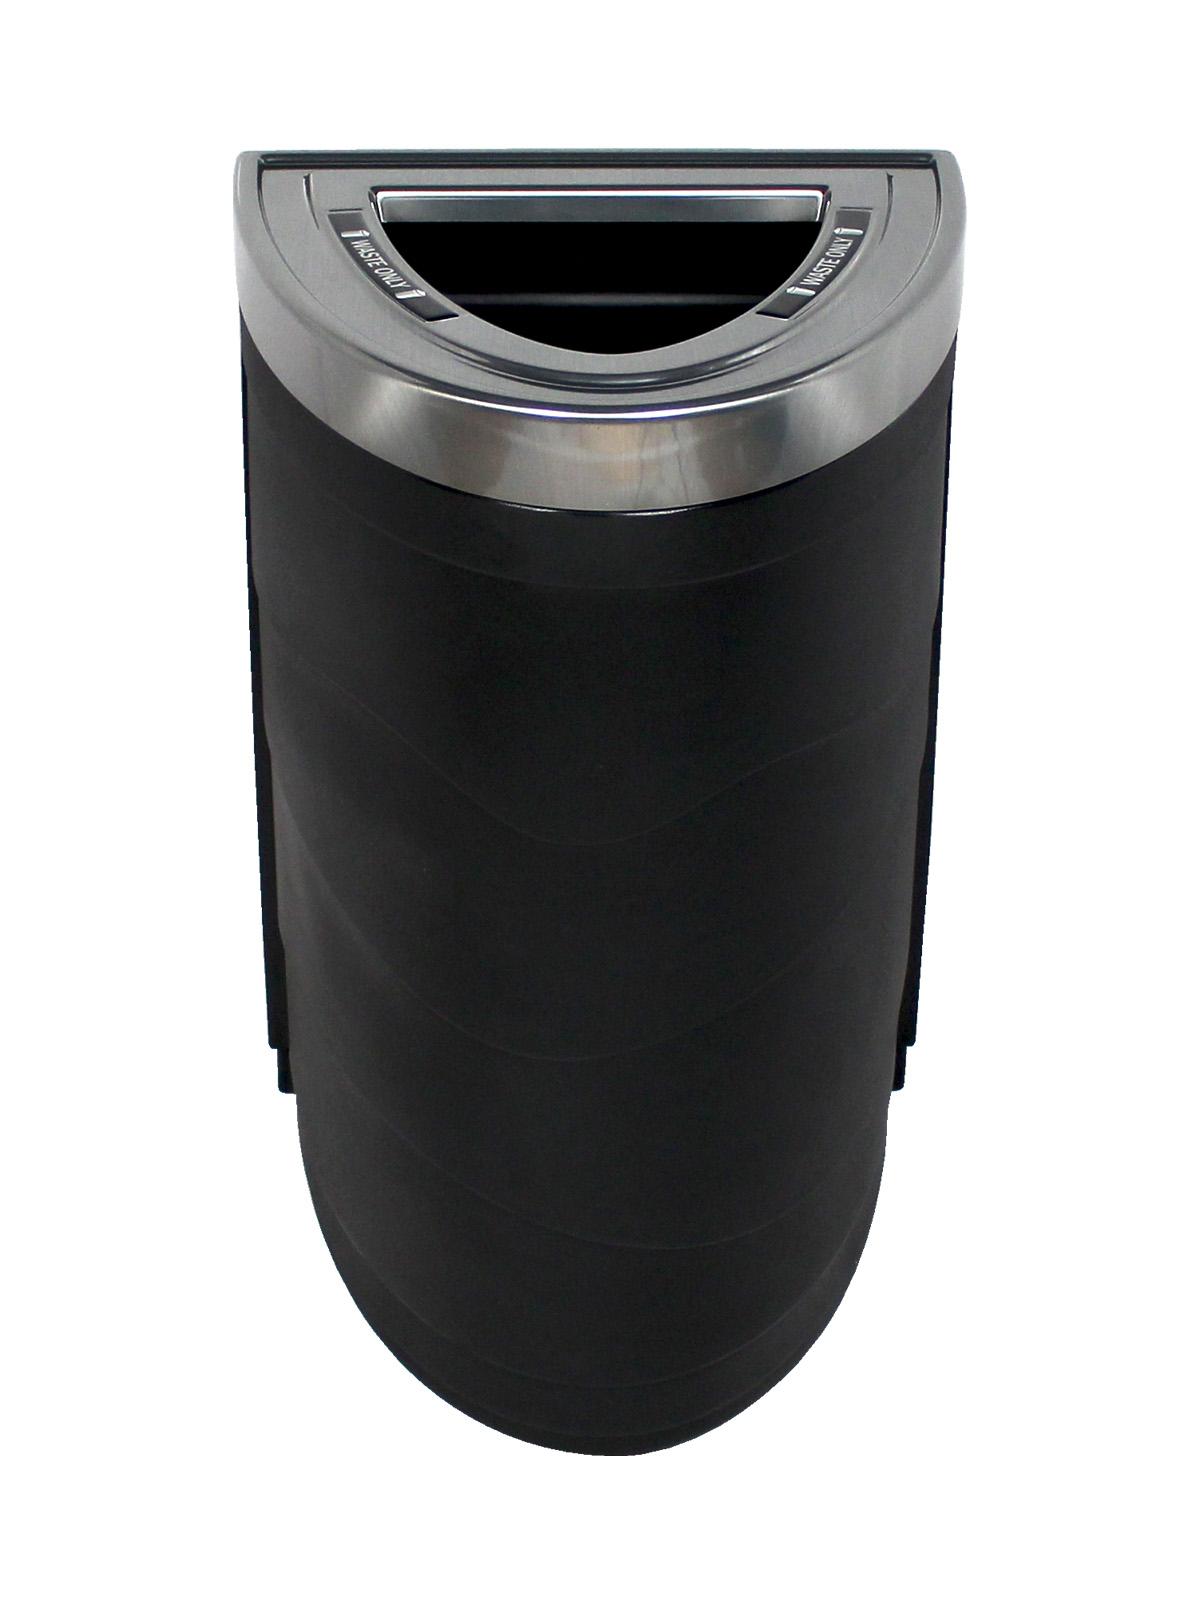 EVOLVE - Single - Waste - Full - Black